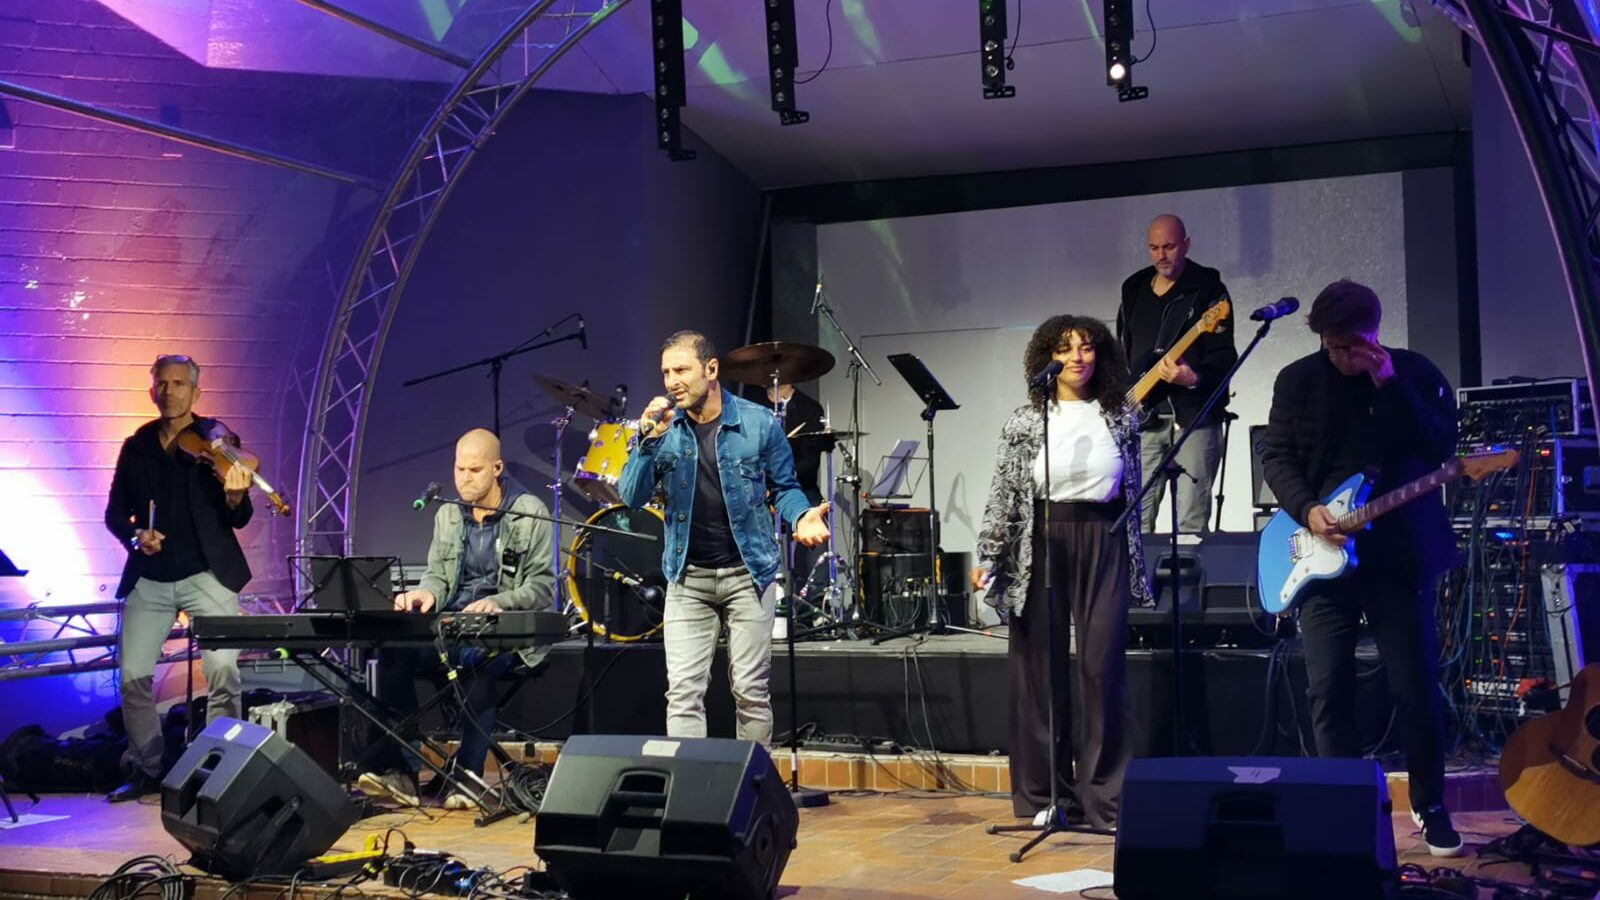 OXMOX präsentierte: Festival-Feeling in Bad Schwartau – 10.000 feierten mit!